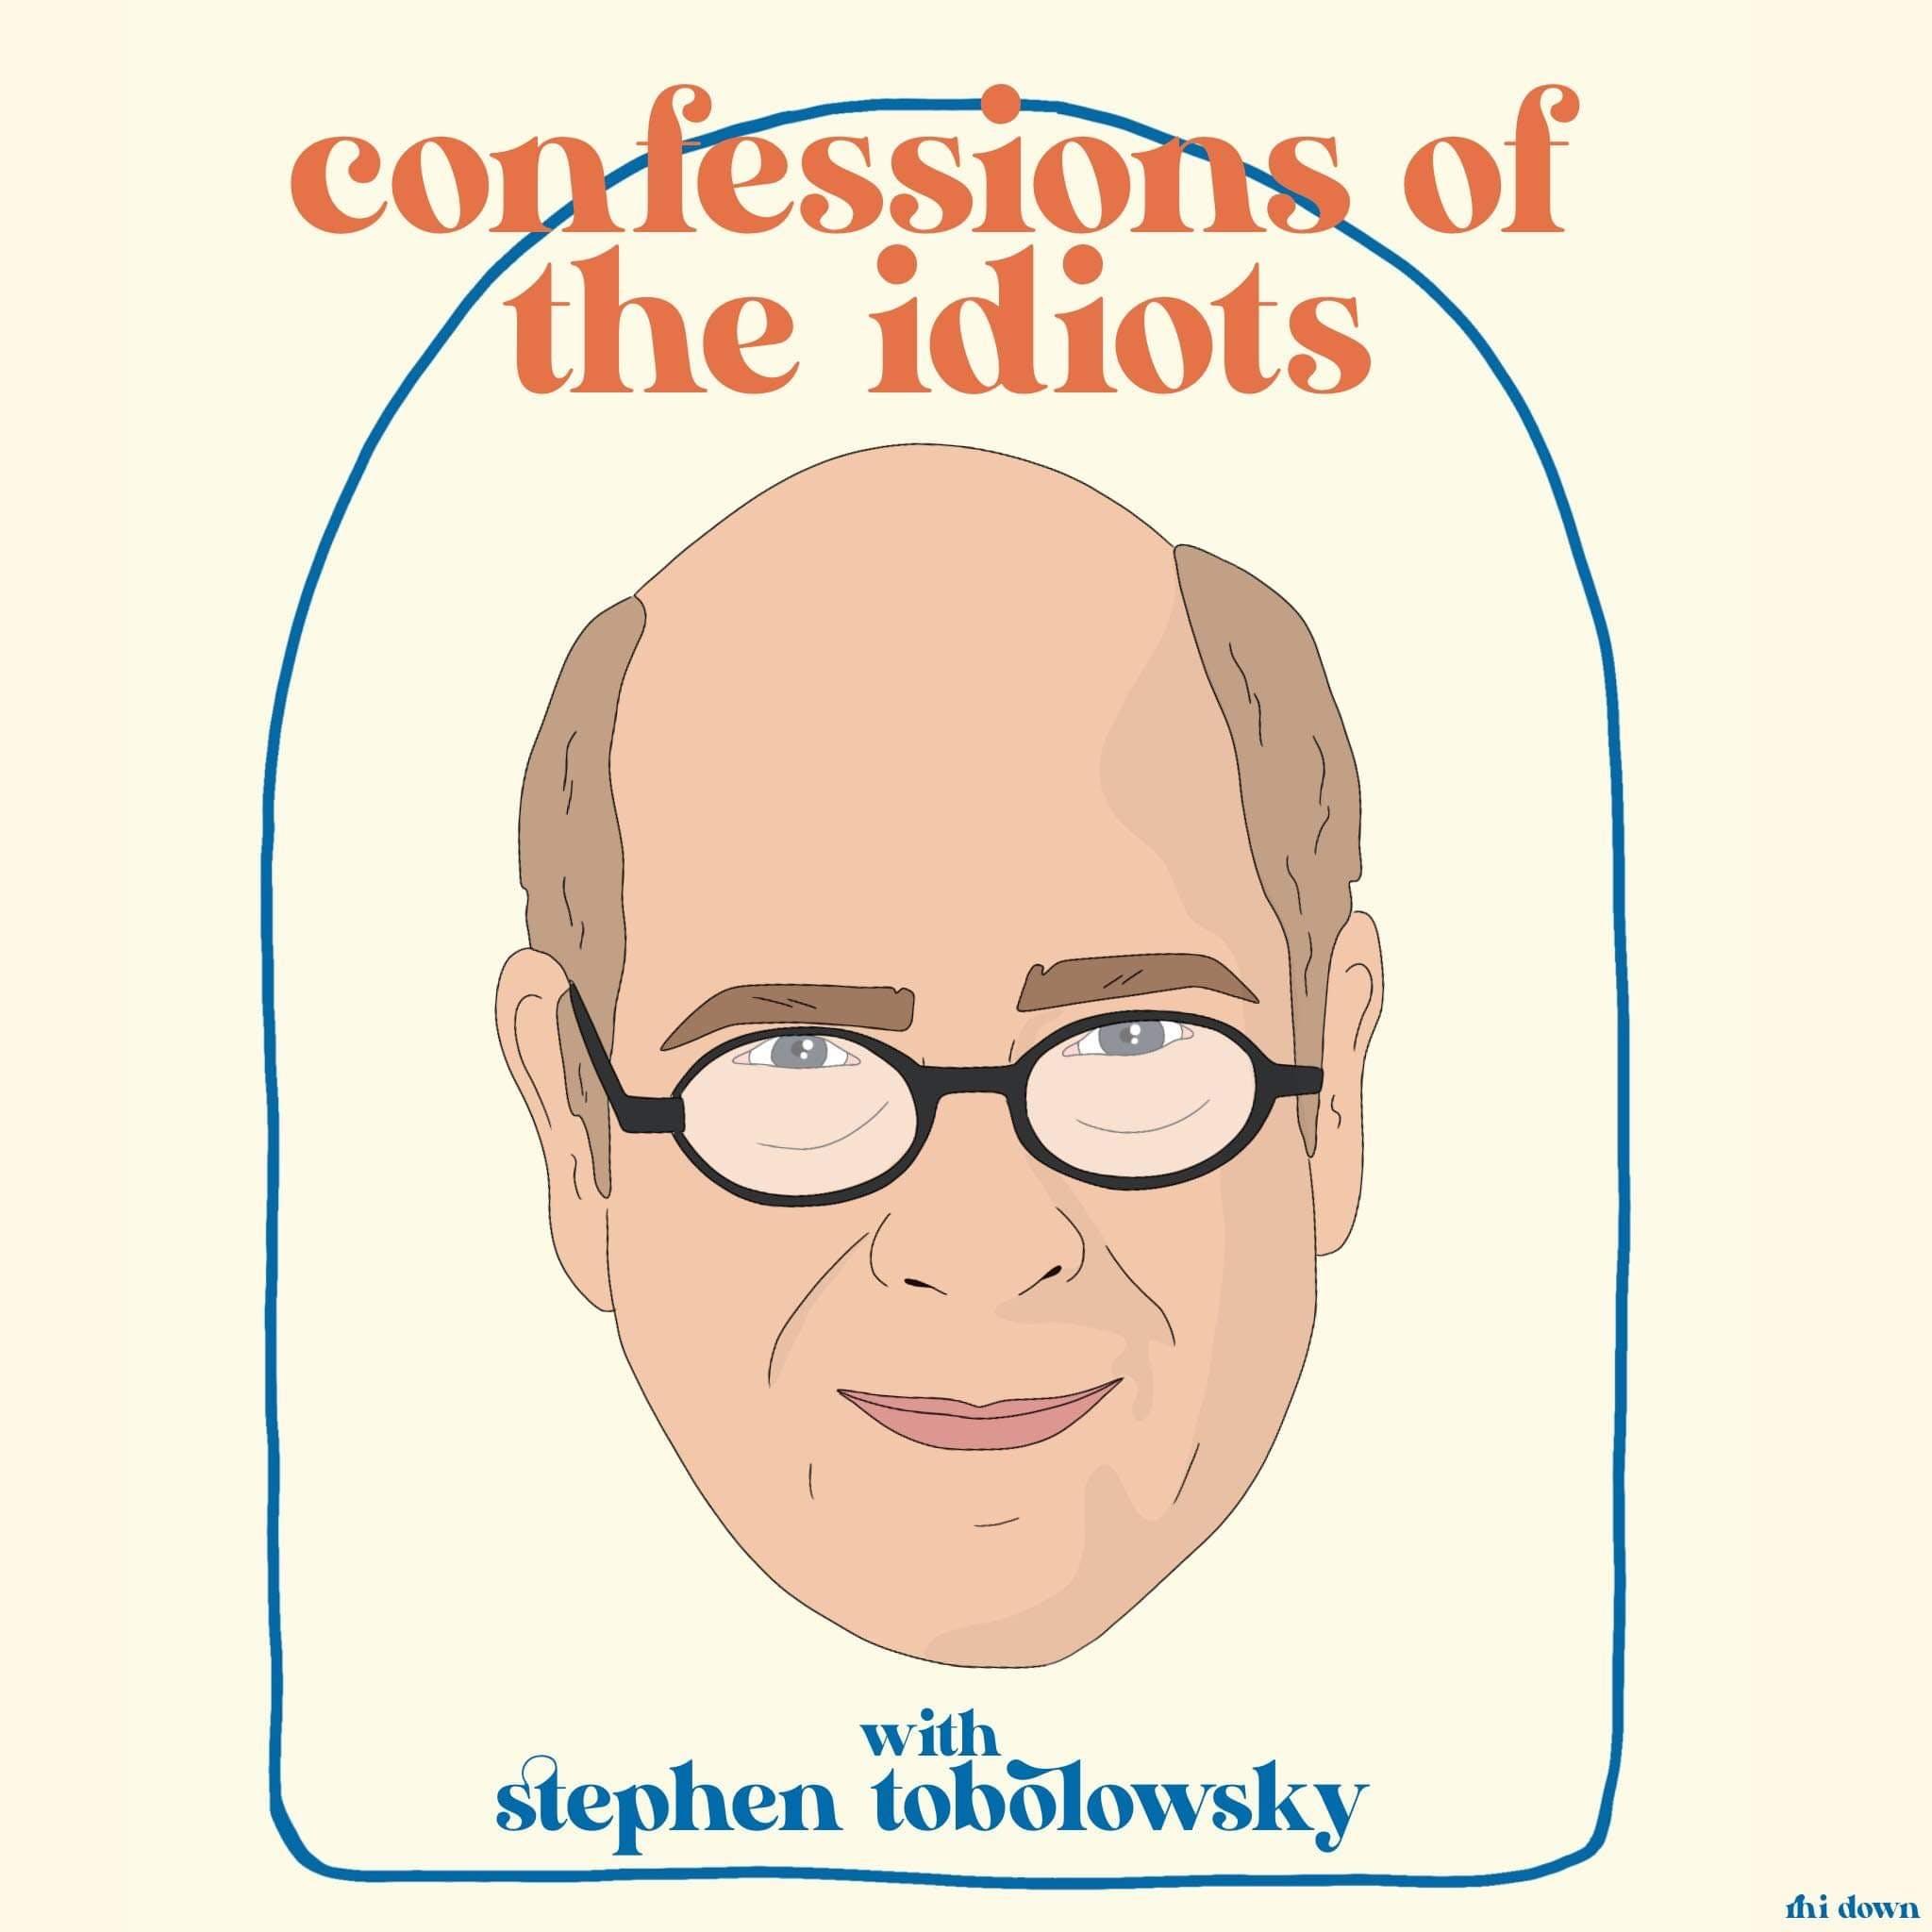 Stephen Tobolowsky RETURNS